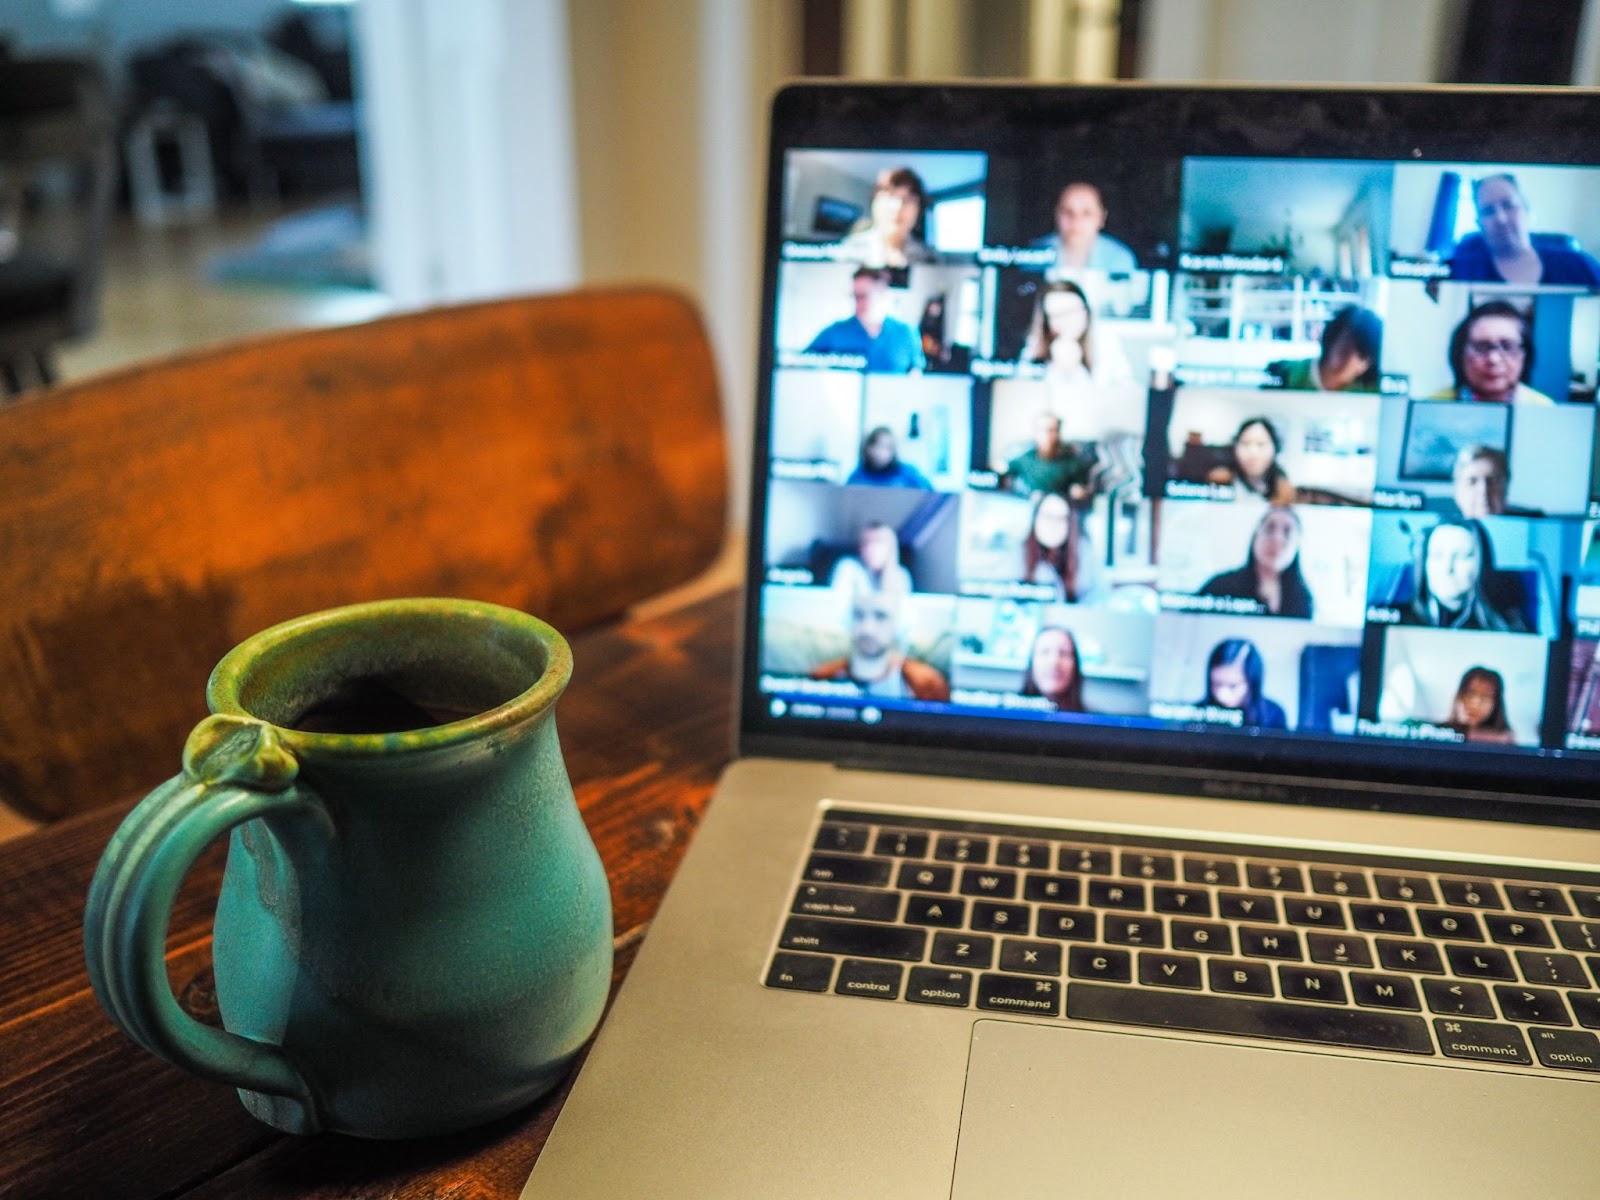 Zoom meeting for remote teams